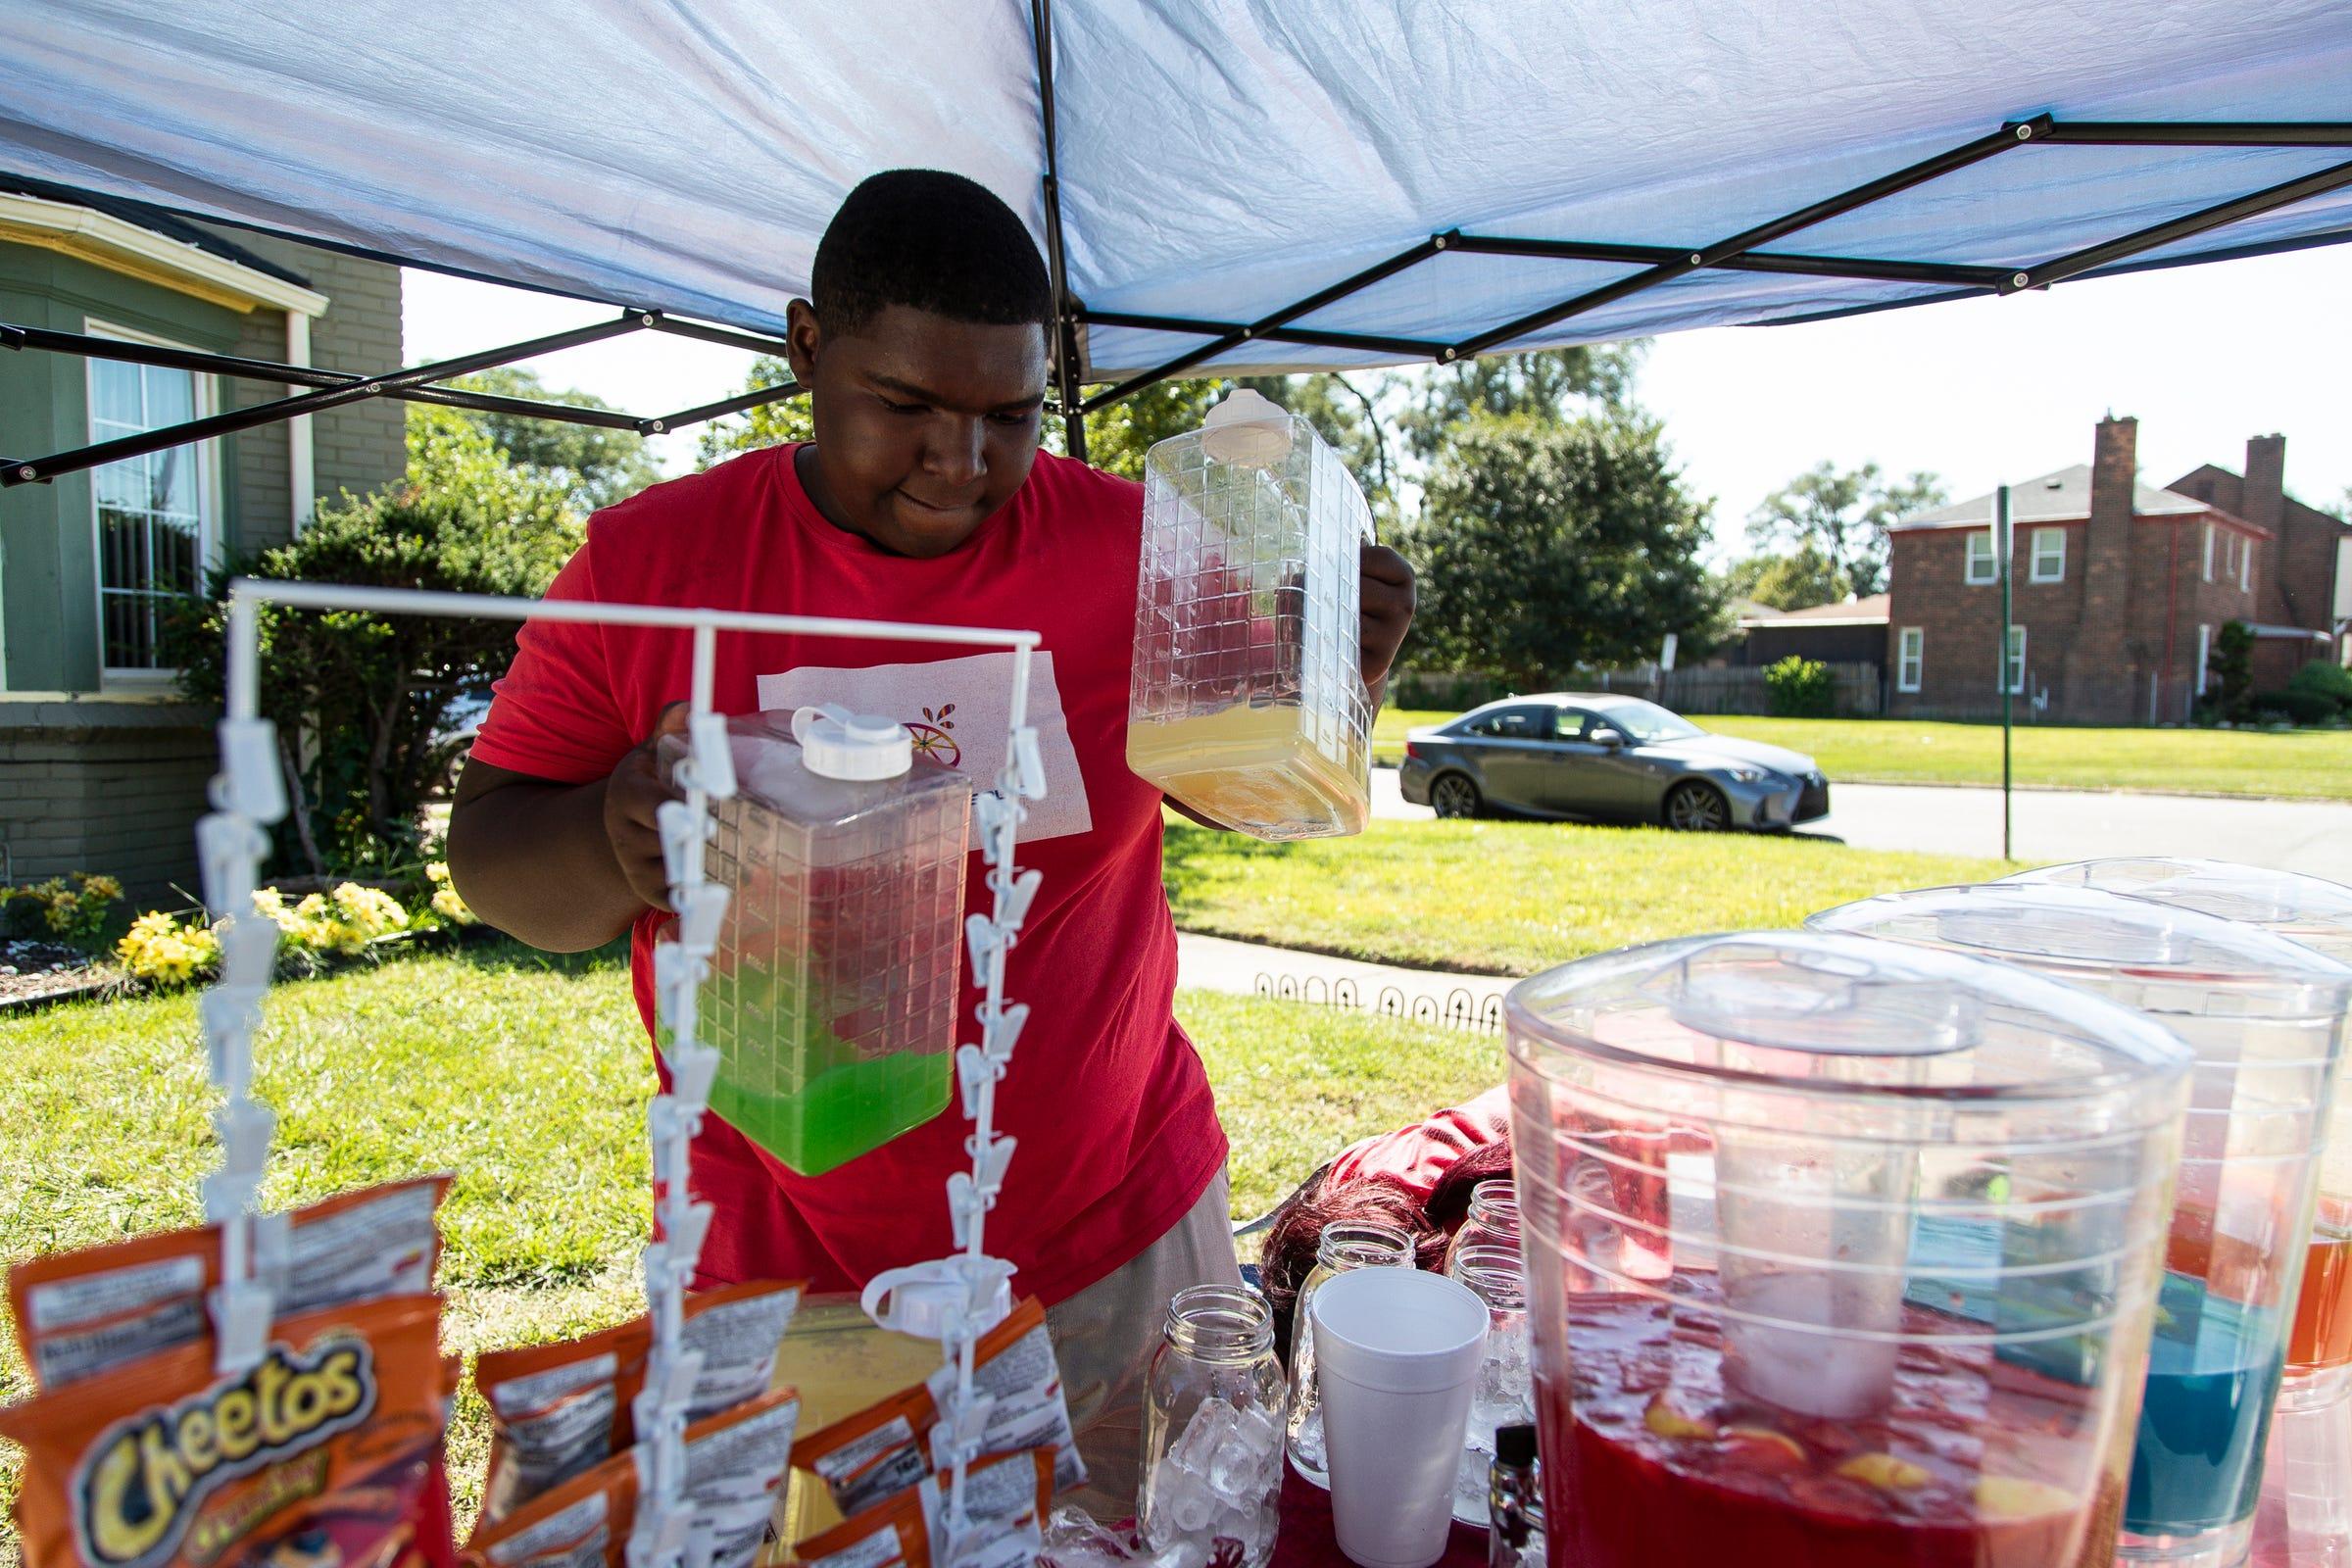 Cyr-Edward Shearon, 14, prepares an order at CB's Lemonade Plus on Seven Mile Road in Detroit on Sept. 2, 2021.